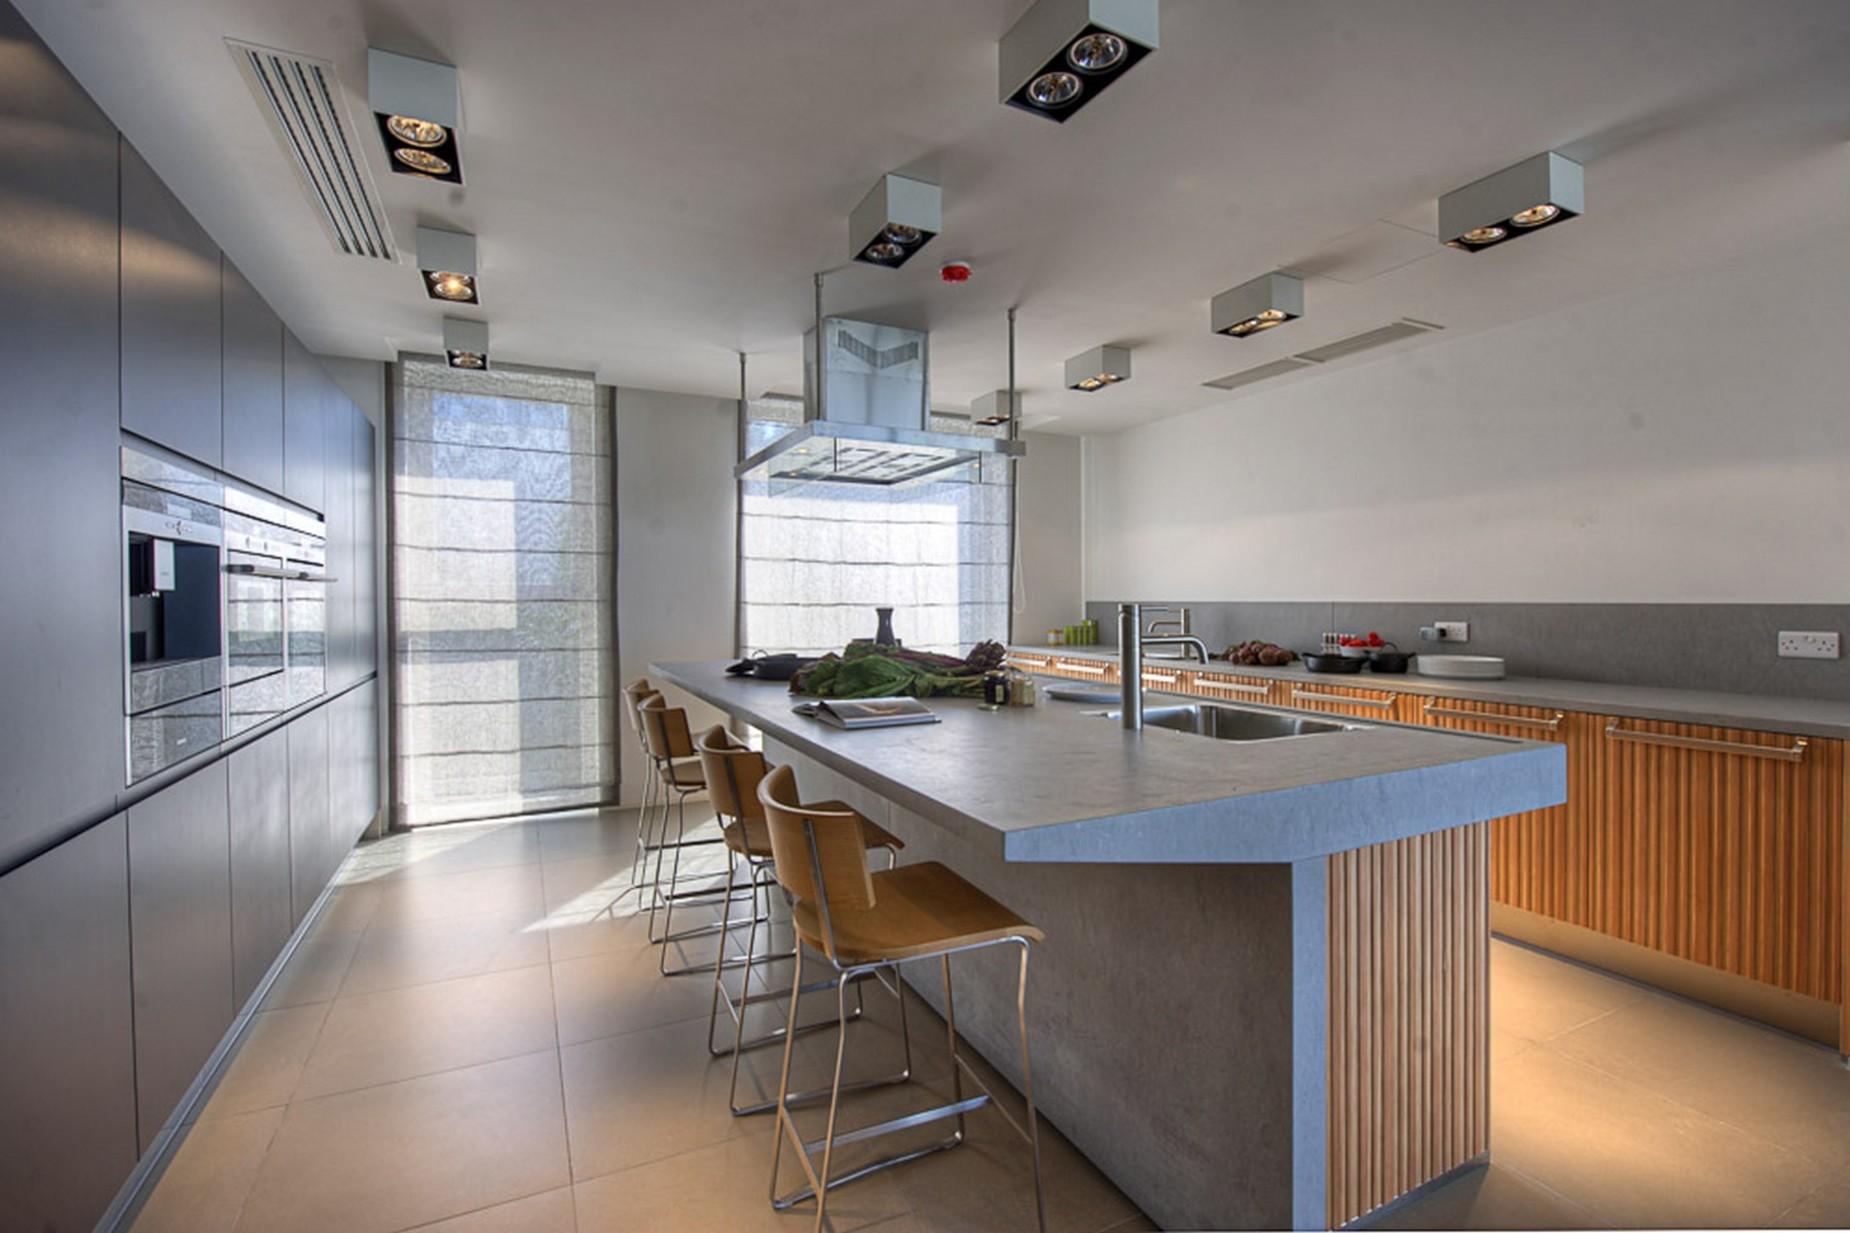 3 bed Villa For Rent in Bahar ic-Caghaq, Bahar ic-Caghaq - thumb 10